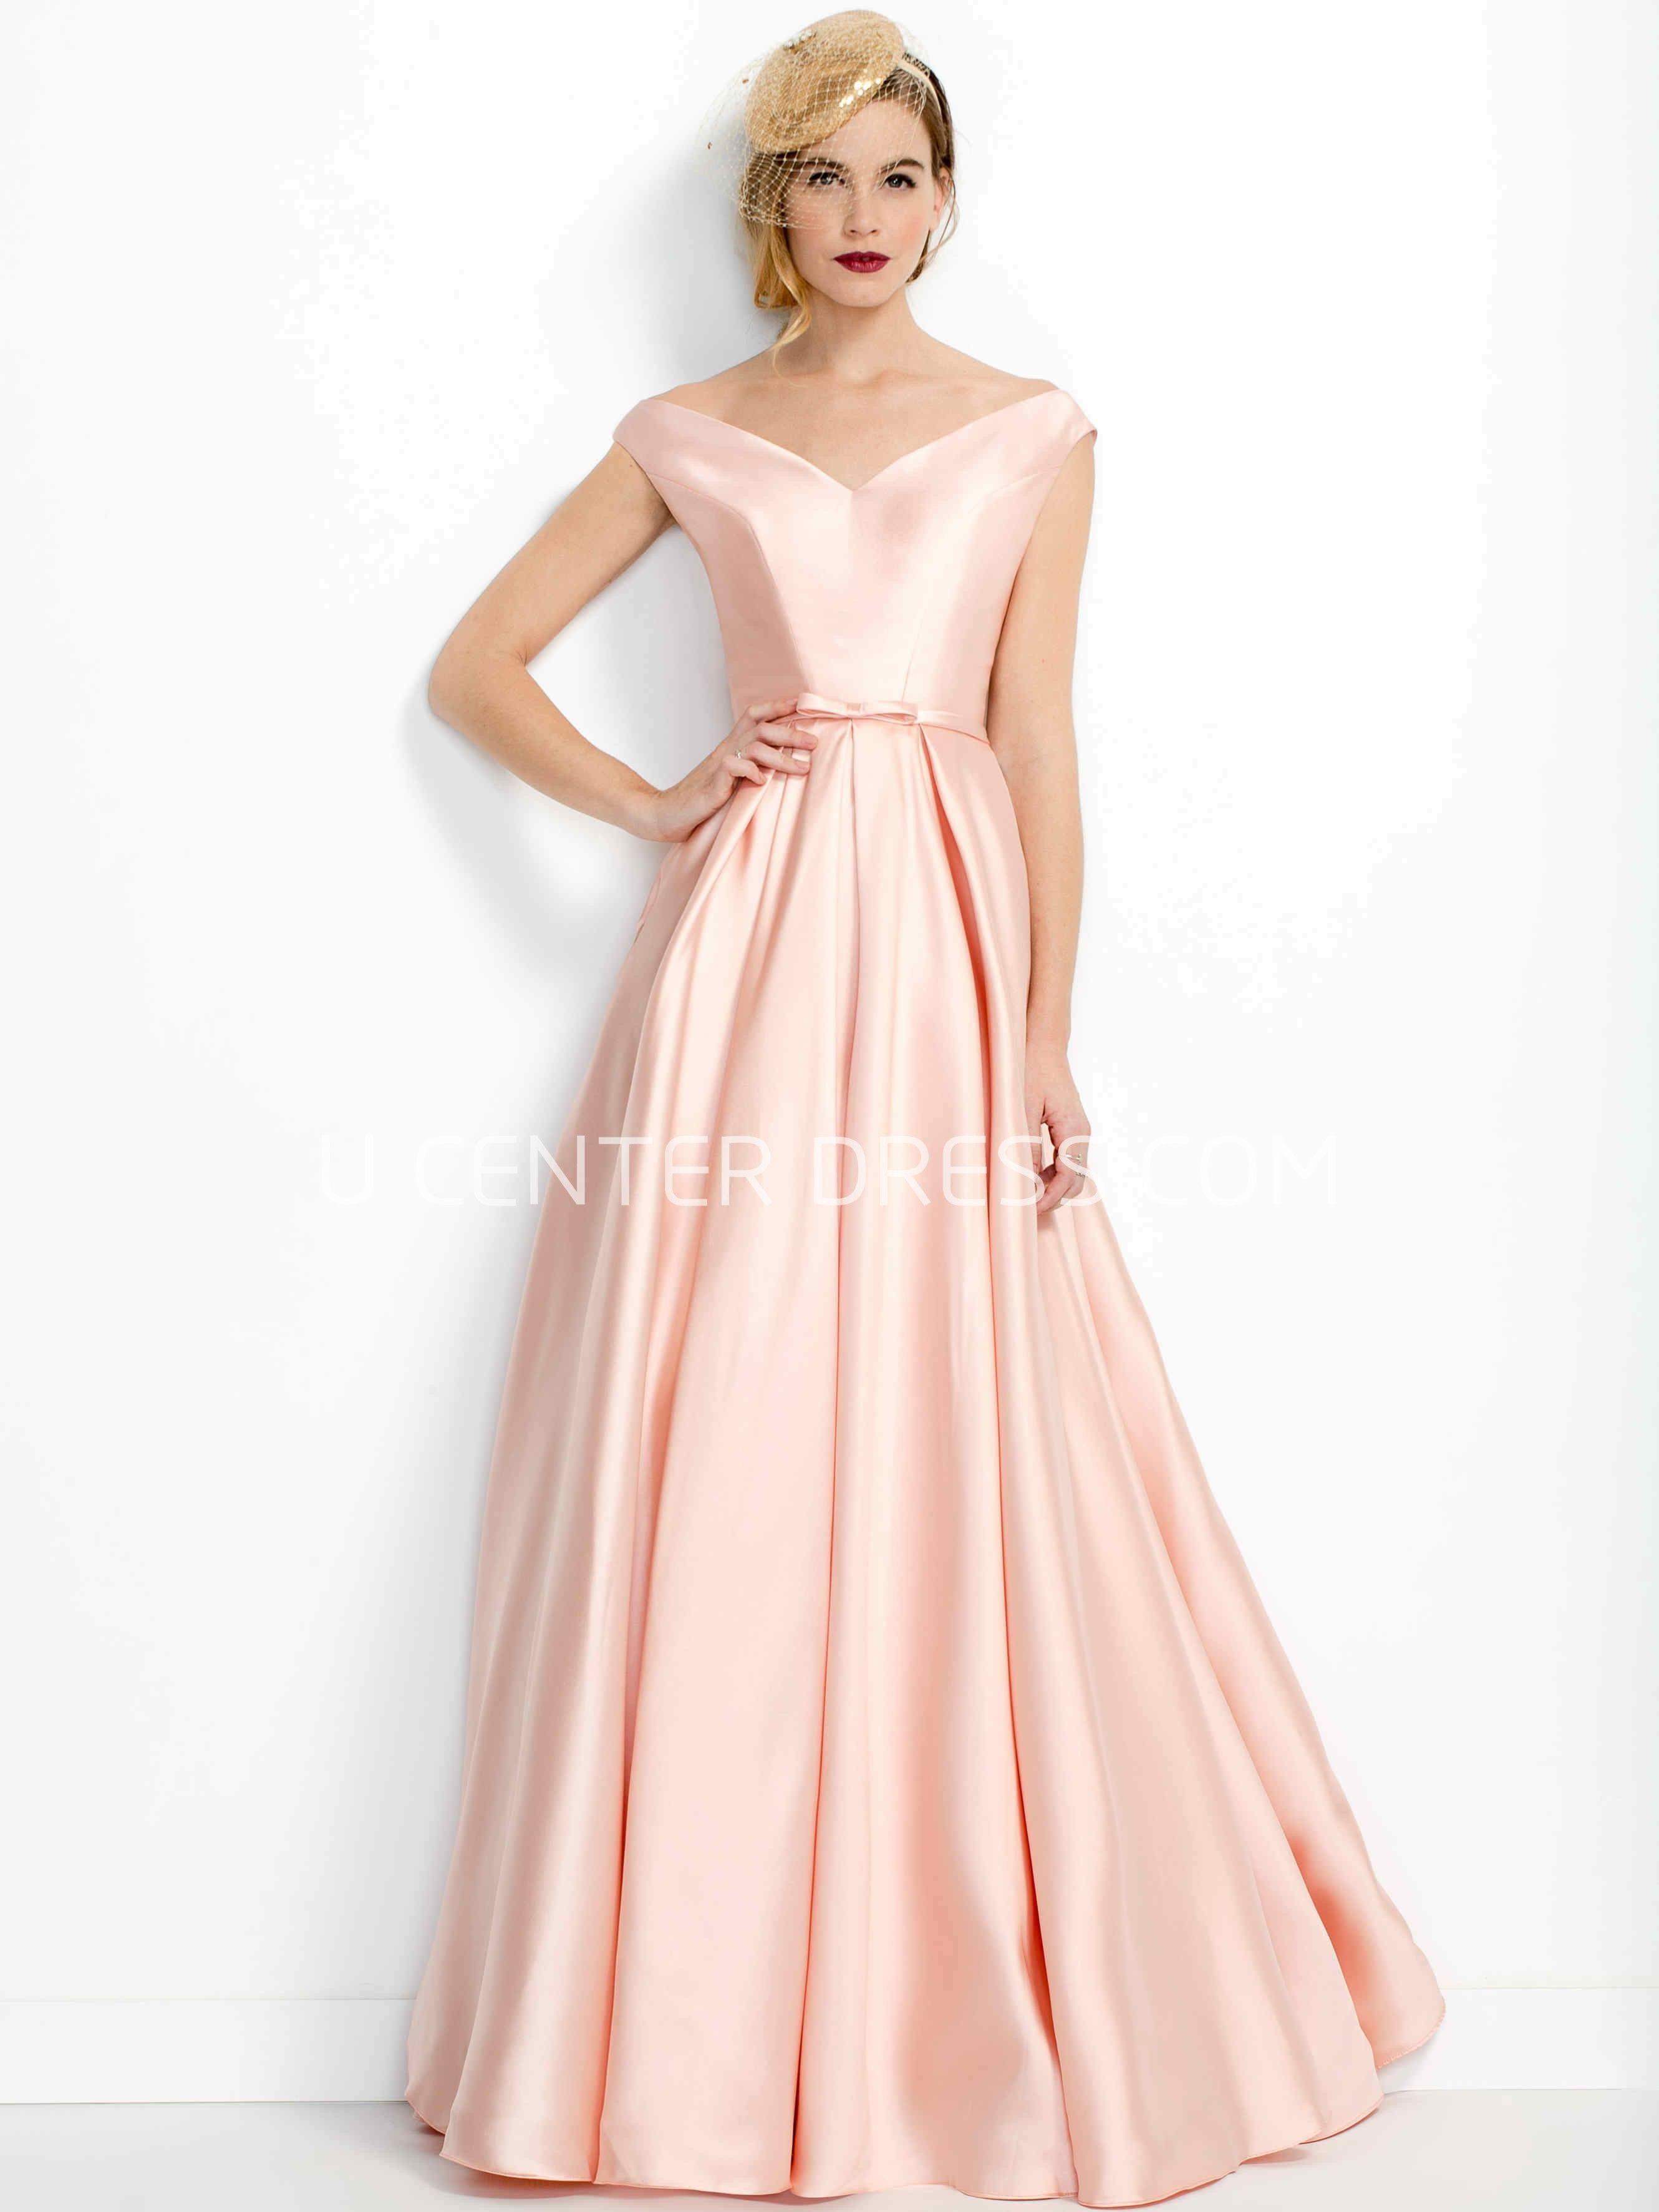 Us 118 49 Fabulous Caroline Off The Shoulder Pink Long Prom Dress Http Www Ucenterdress Com Fabulous Caroline Prom Dress Pmk 300624 Html Shop For C Vestidos [ 3547 x 2660 Pixel ]